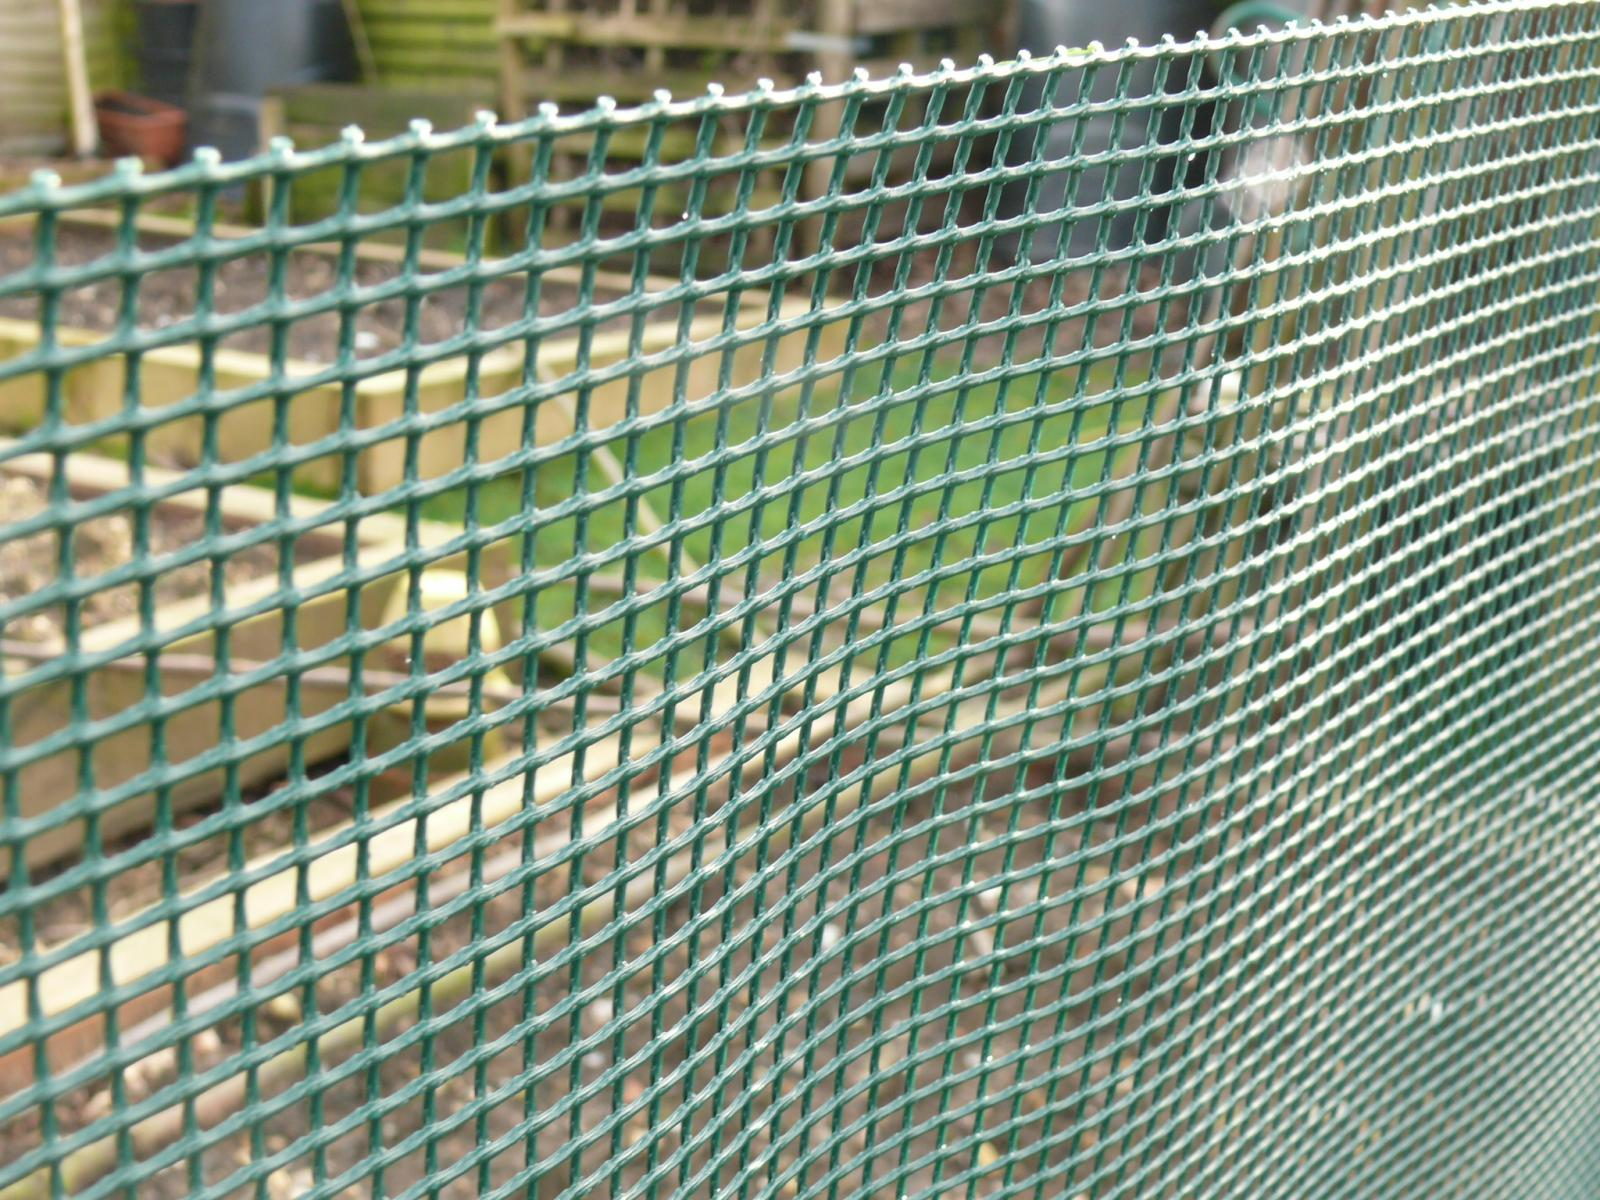 Garden fence m mesh pet fencing dog boarder netting